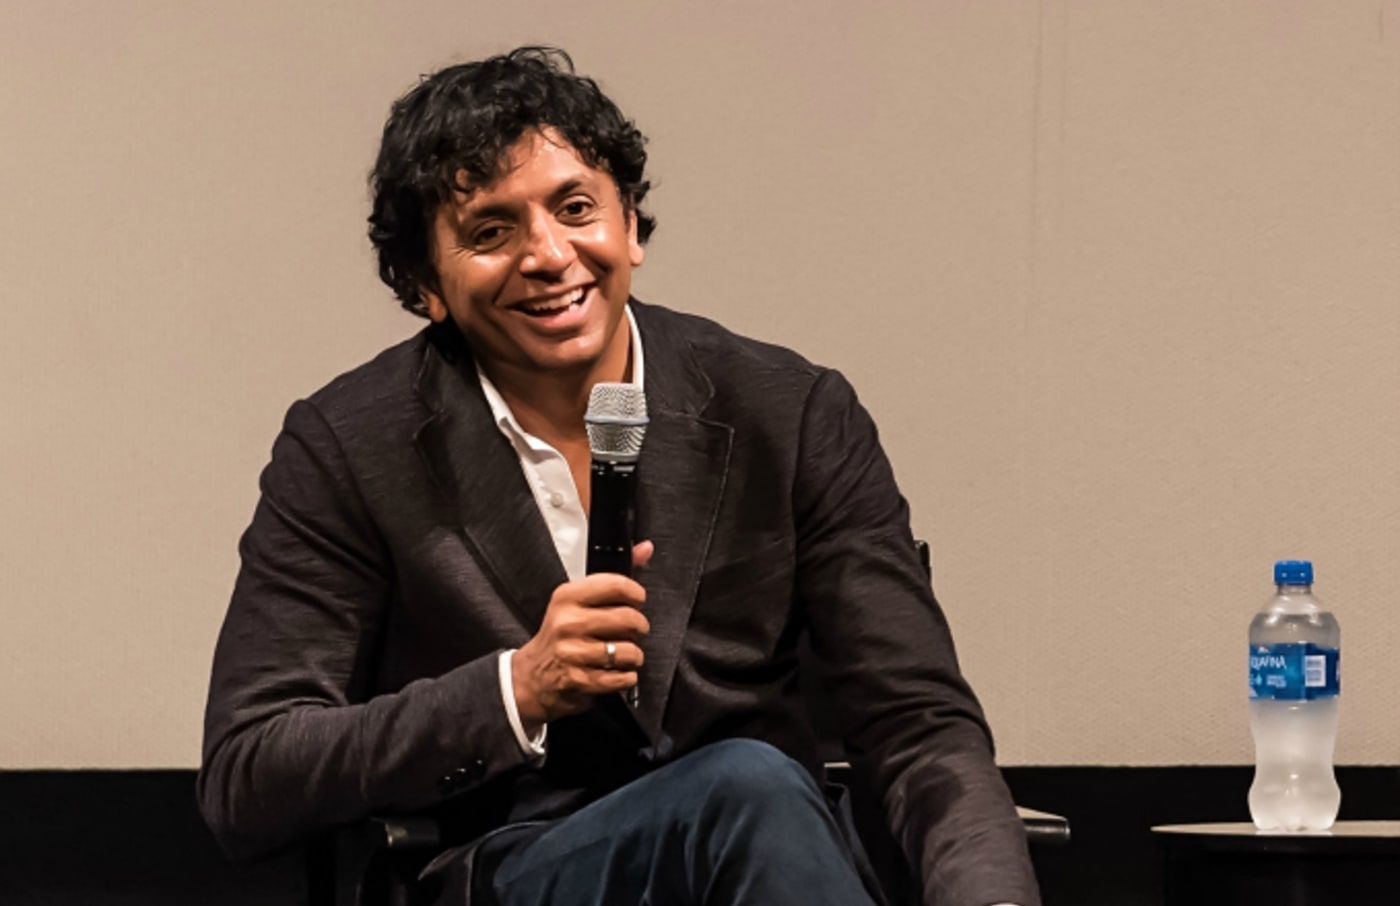 Filmmaker M. Night Shyamalan